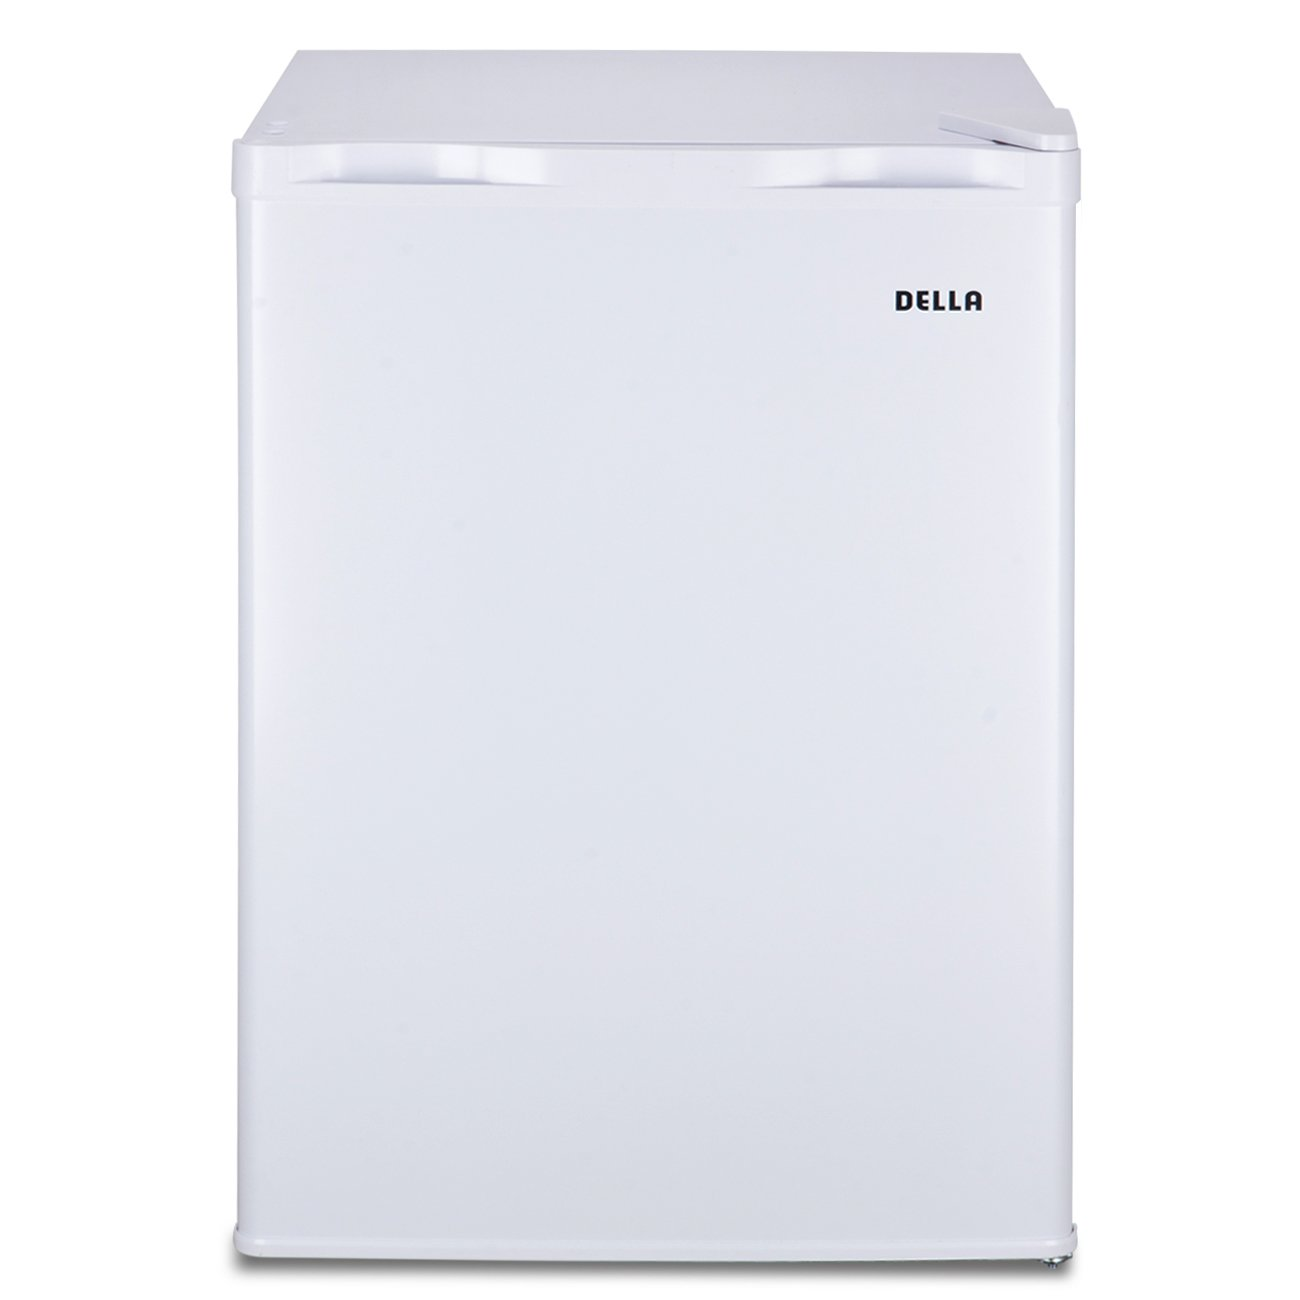 Amazon.com: della 2.6 CU FT Mini refrigerador nevera ...